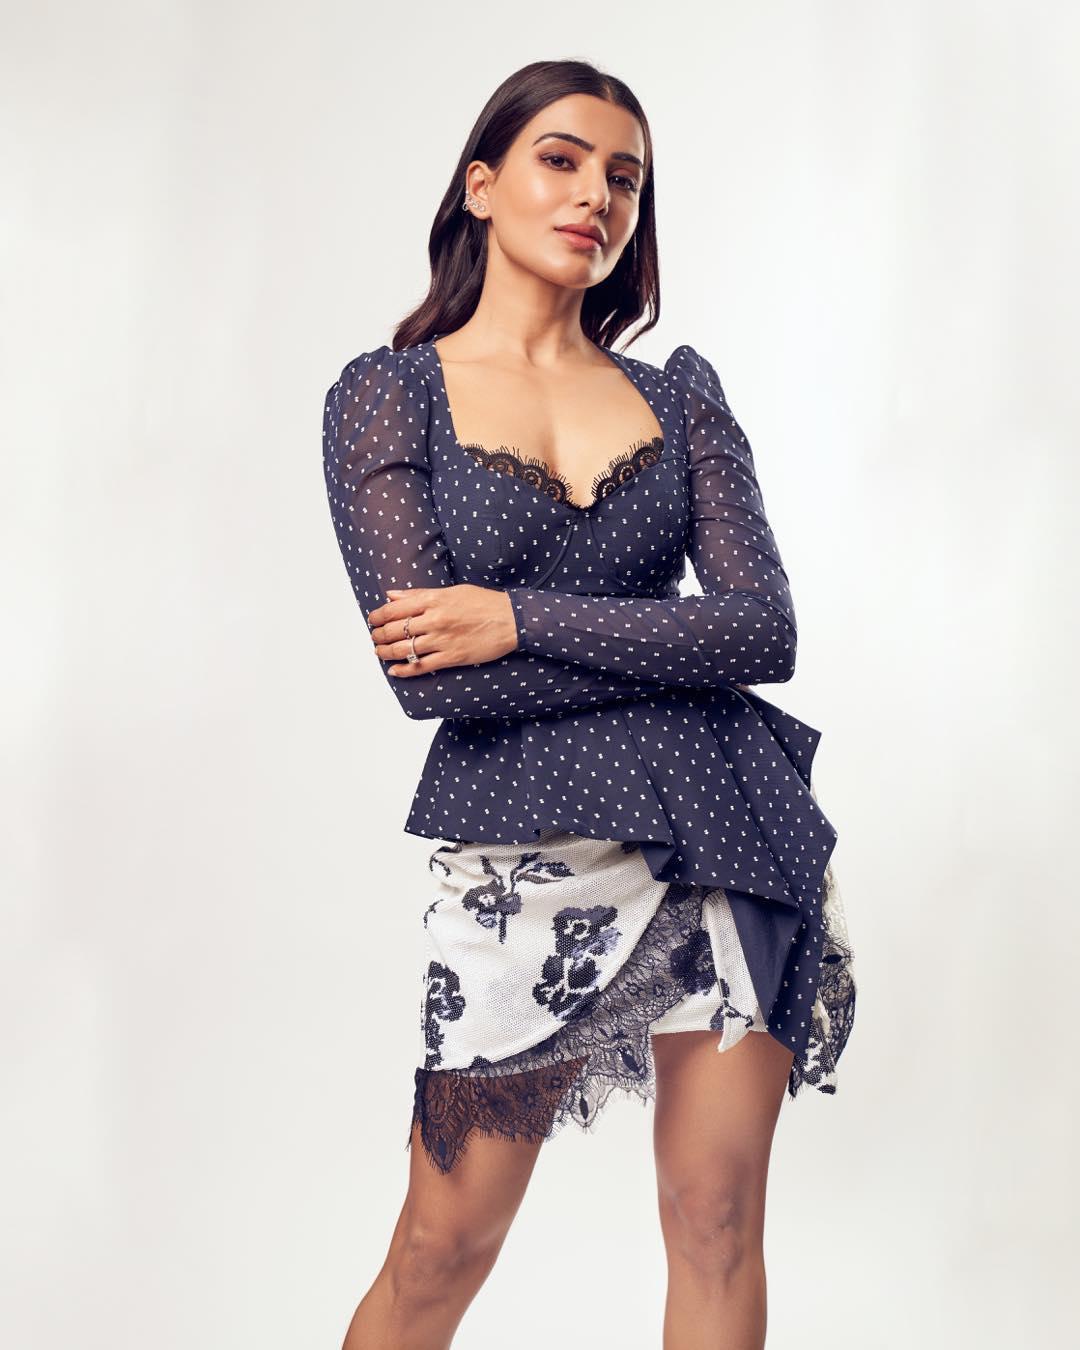 Samantha-Akkineni-Wallpapers-Insta-Fit-Bio-2